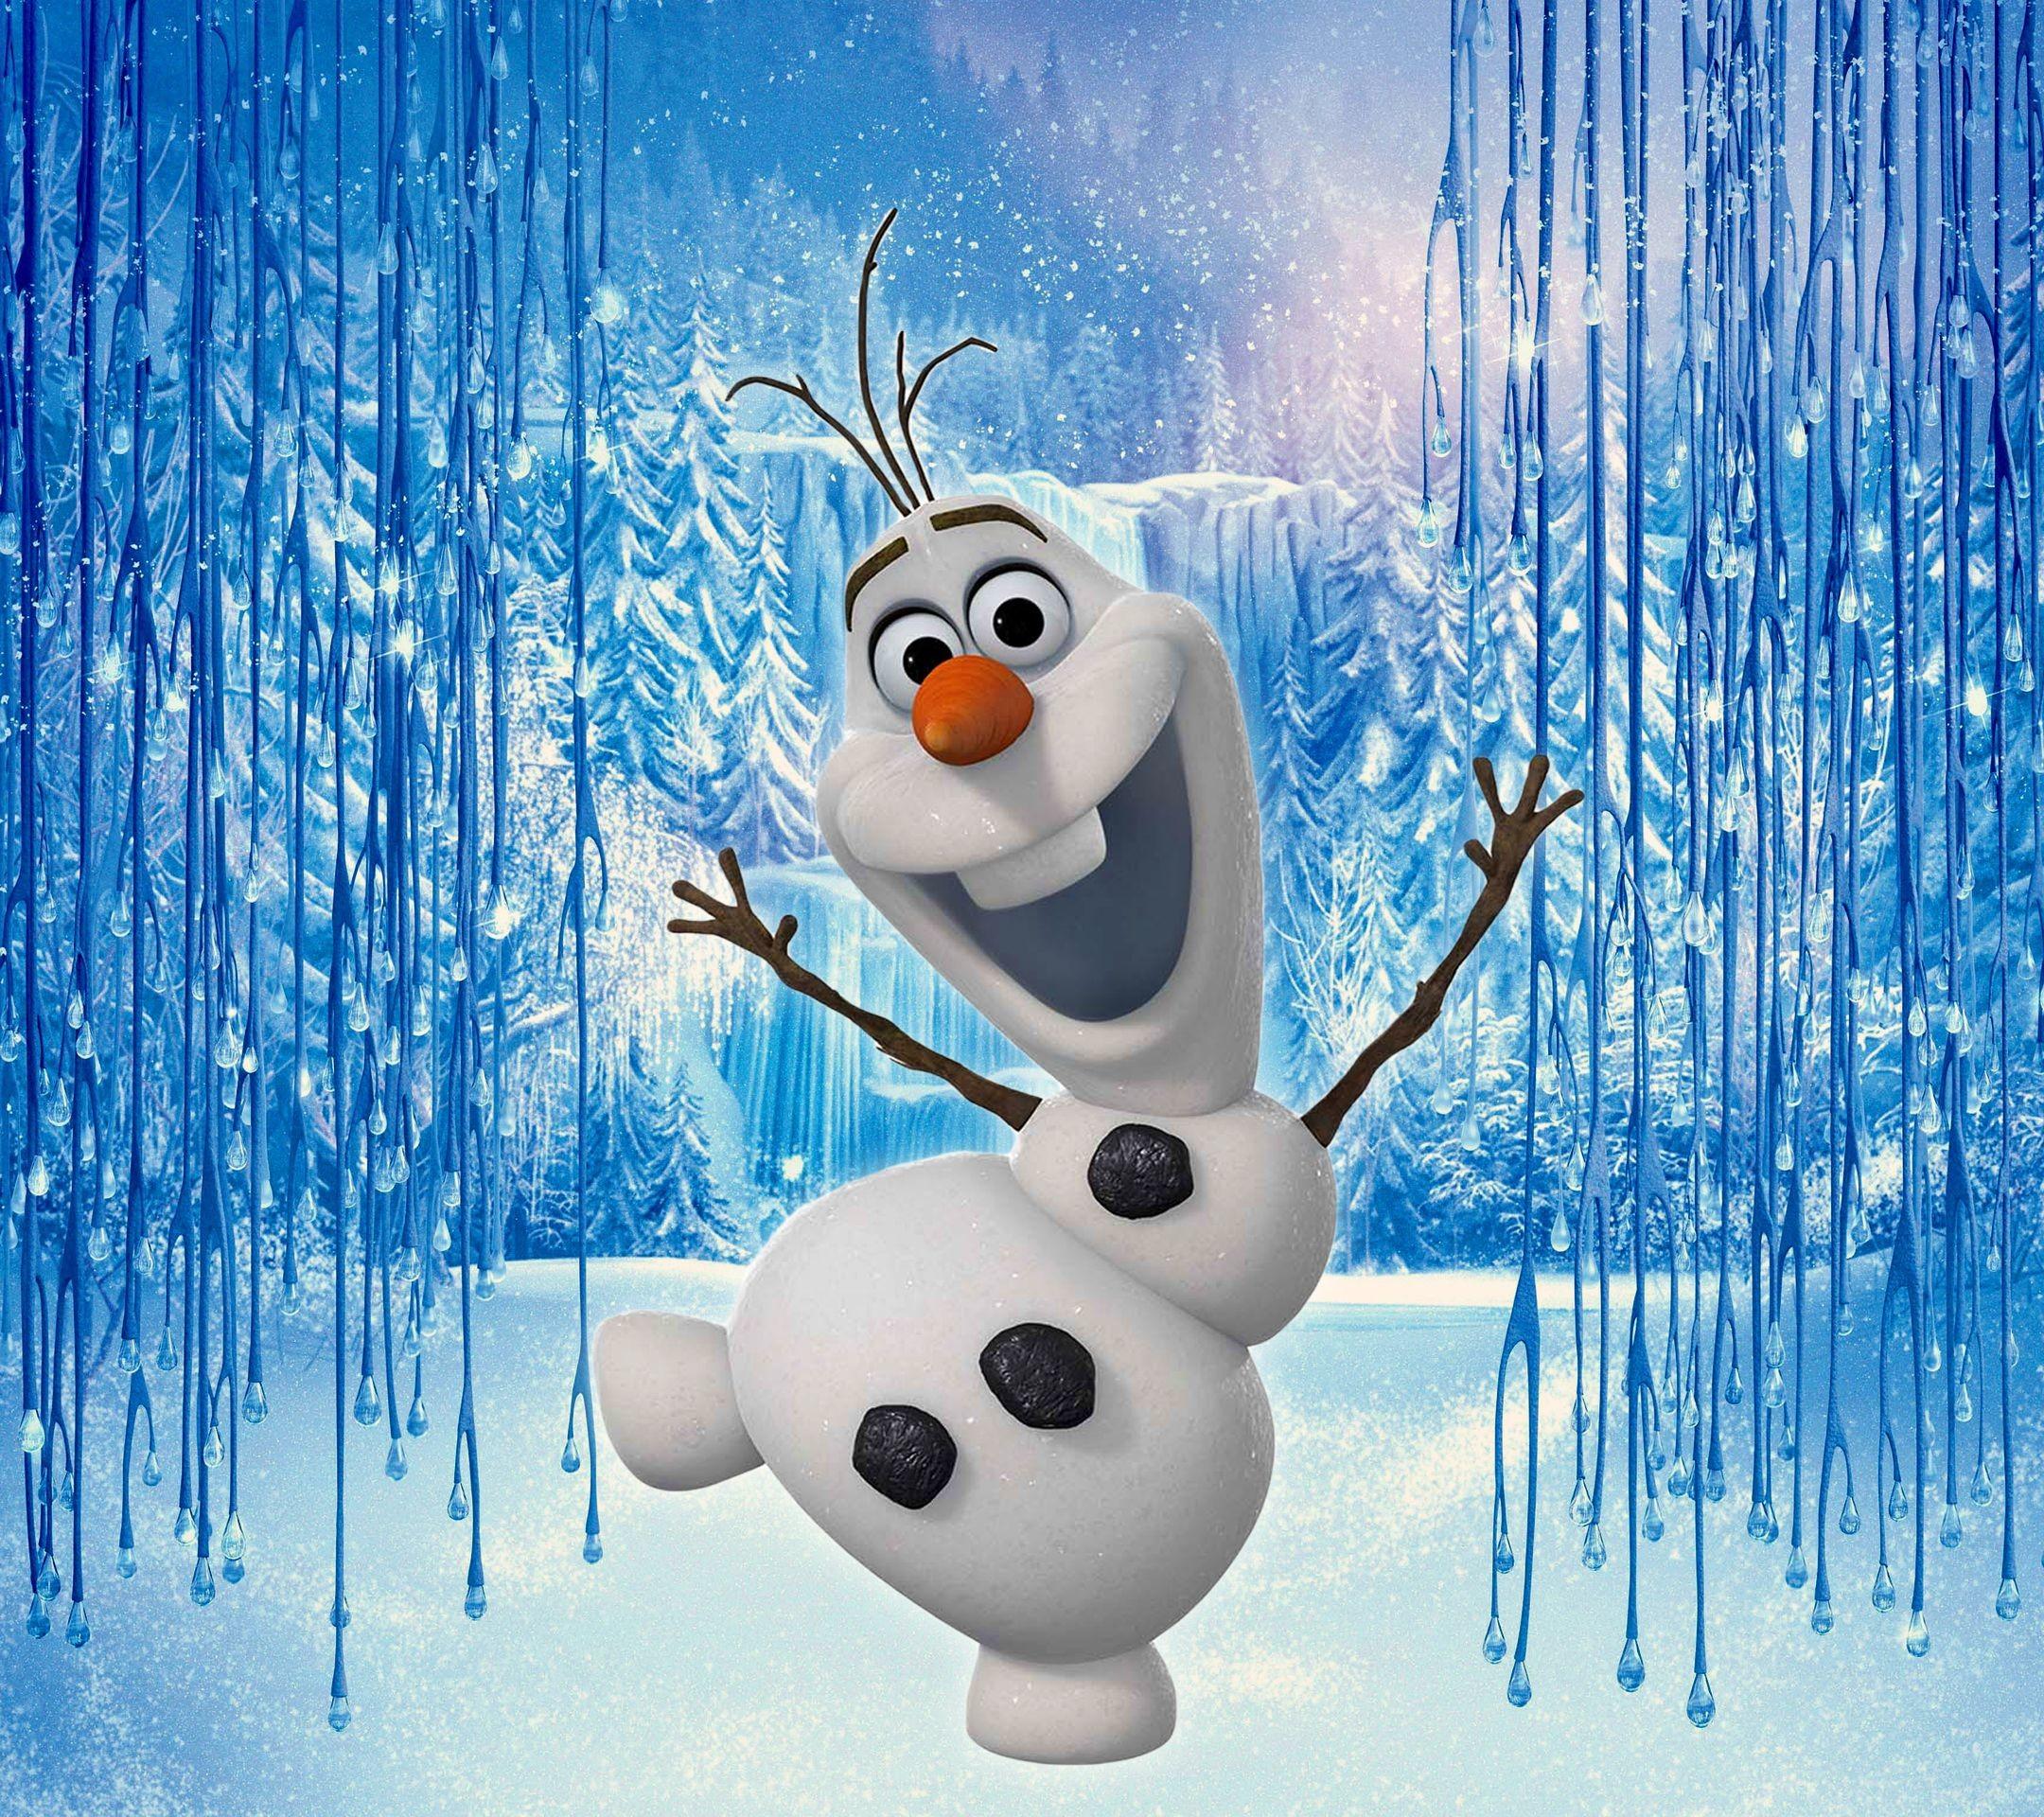 Res: 2160x1920, olaf wallpaper | Olaf Frozen Wallpaper | Papel de parede para celular -  Download